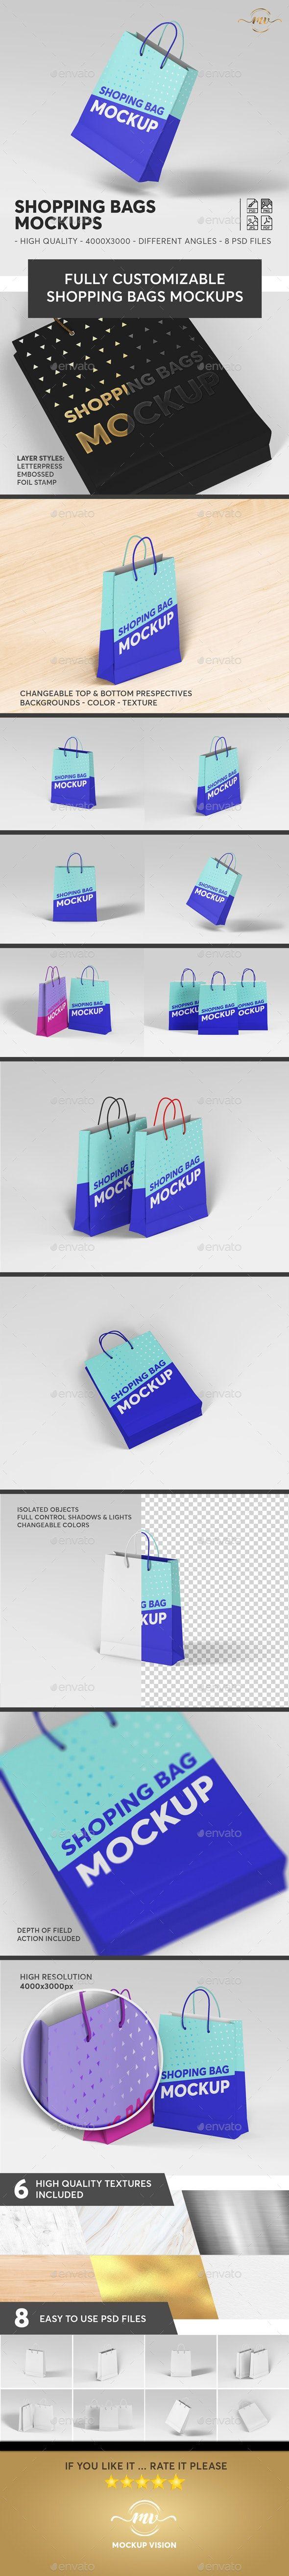 Download Shopping Bags Mockups Bag Mockup Stationery Mockup Box Packaging Design